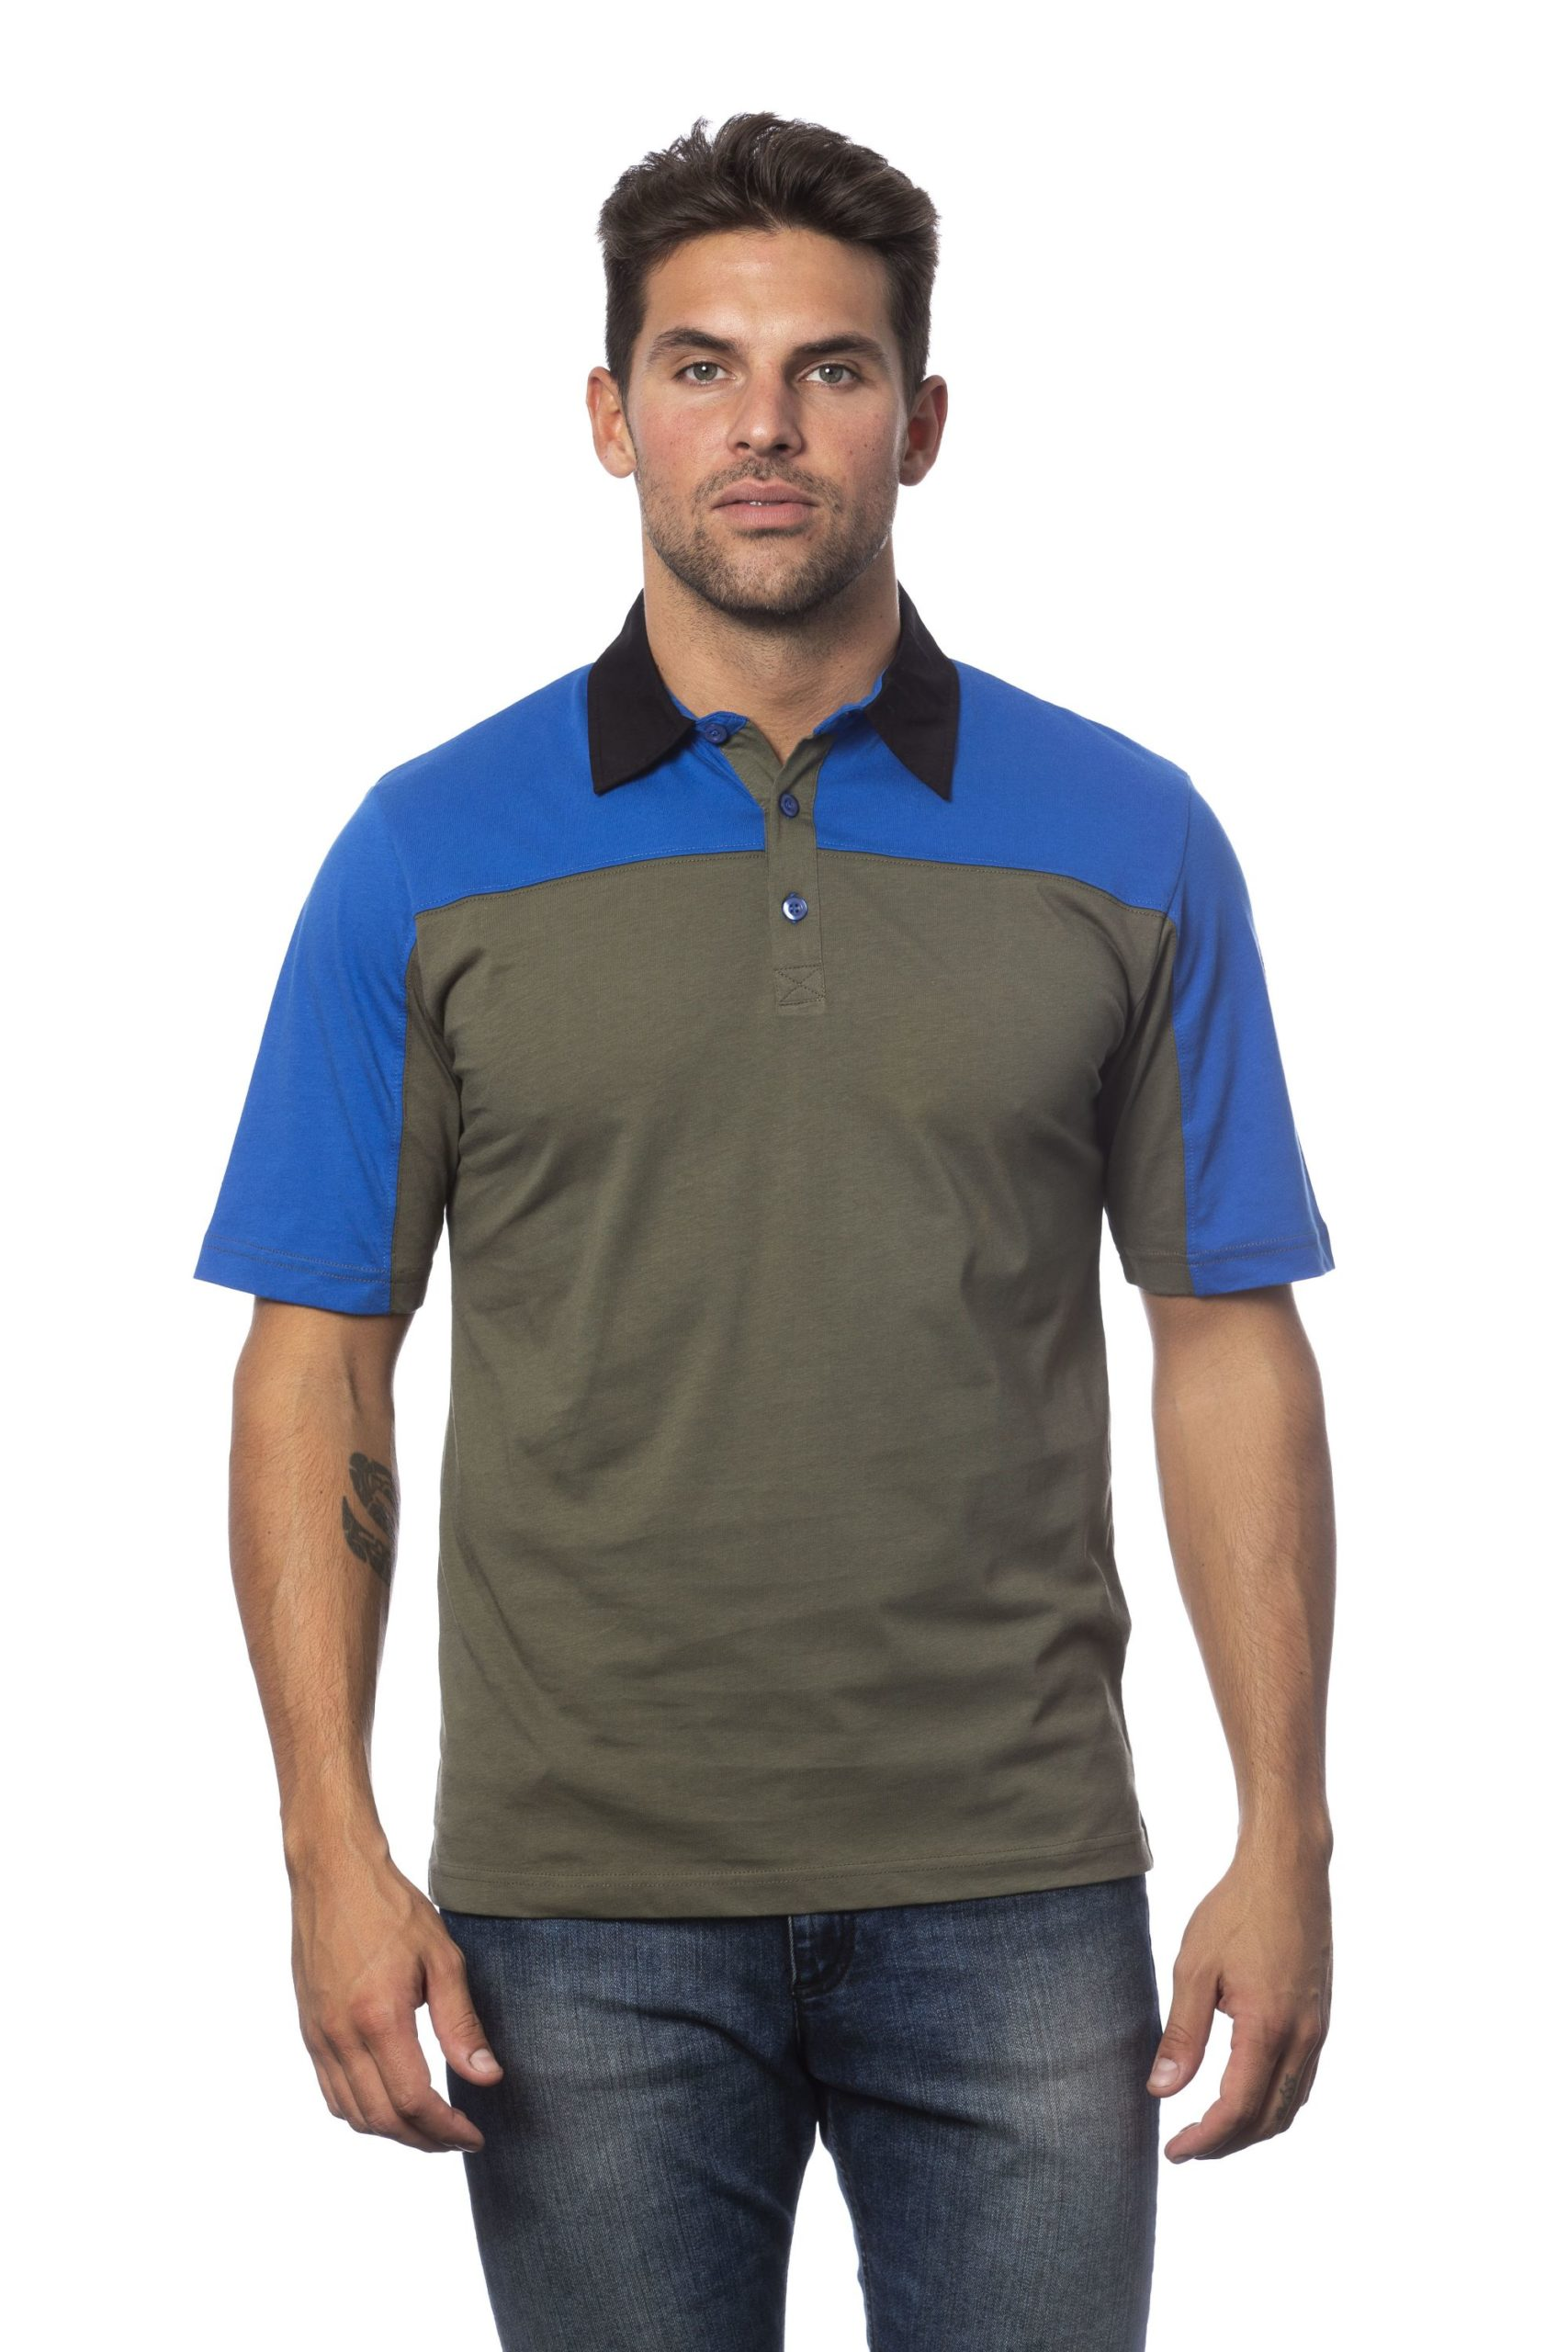 Verri Men's Polo Shirt Multicolor VE994860 - M